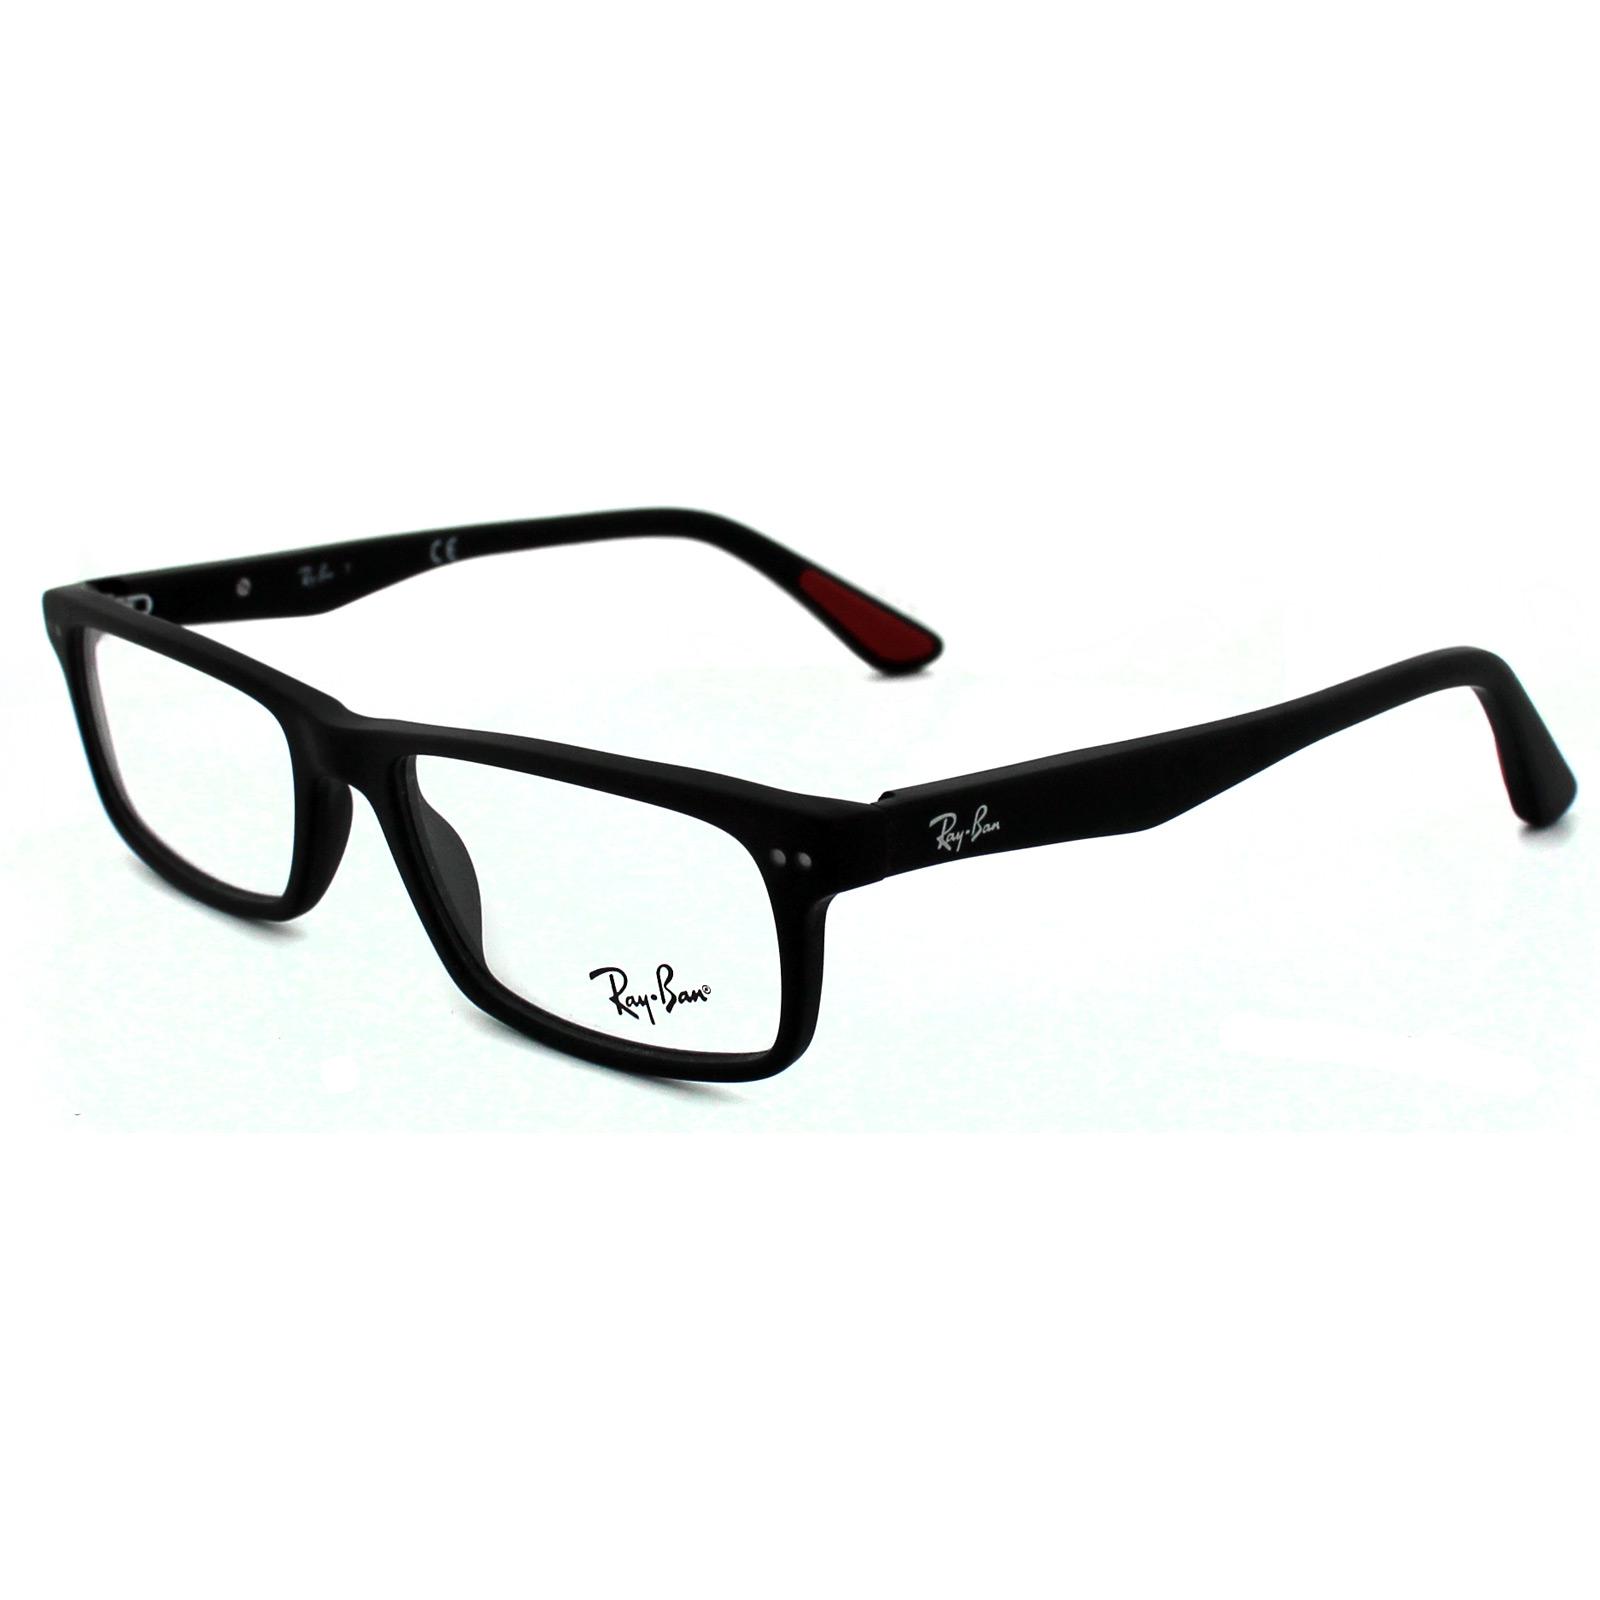 sentinel ray ban glasses frames 5277 2077 sandblasted black